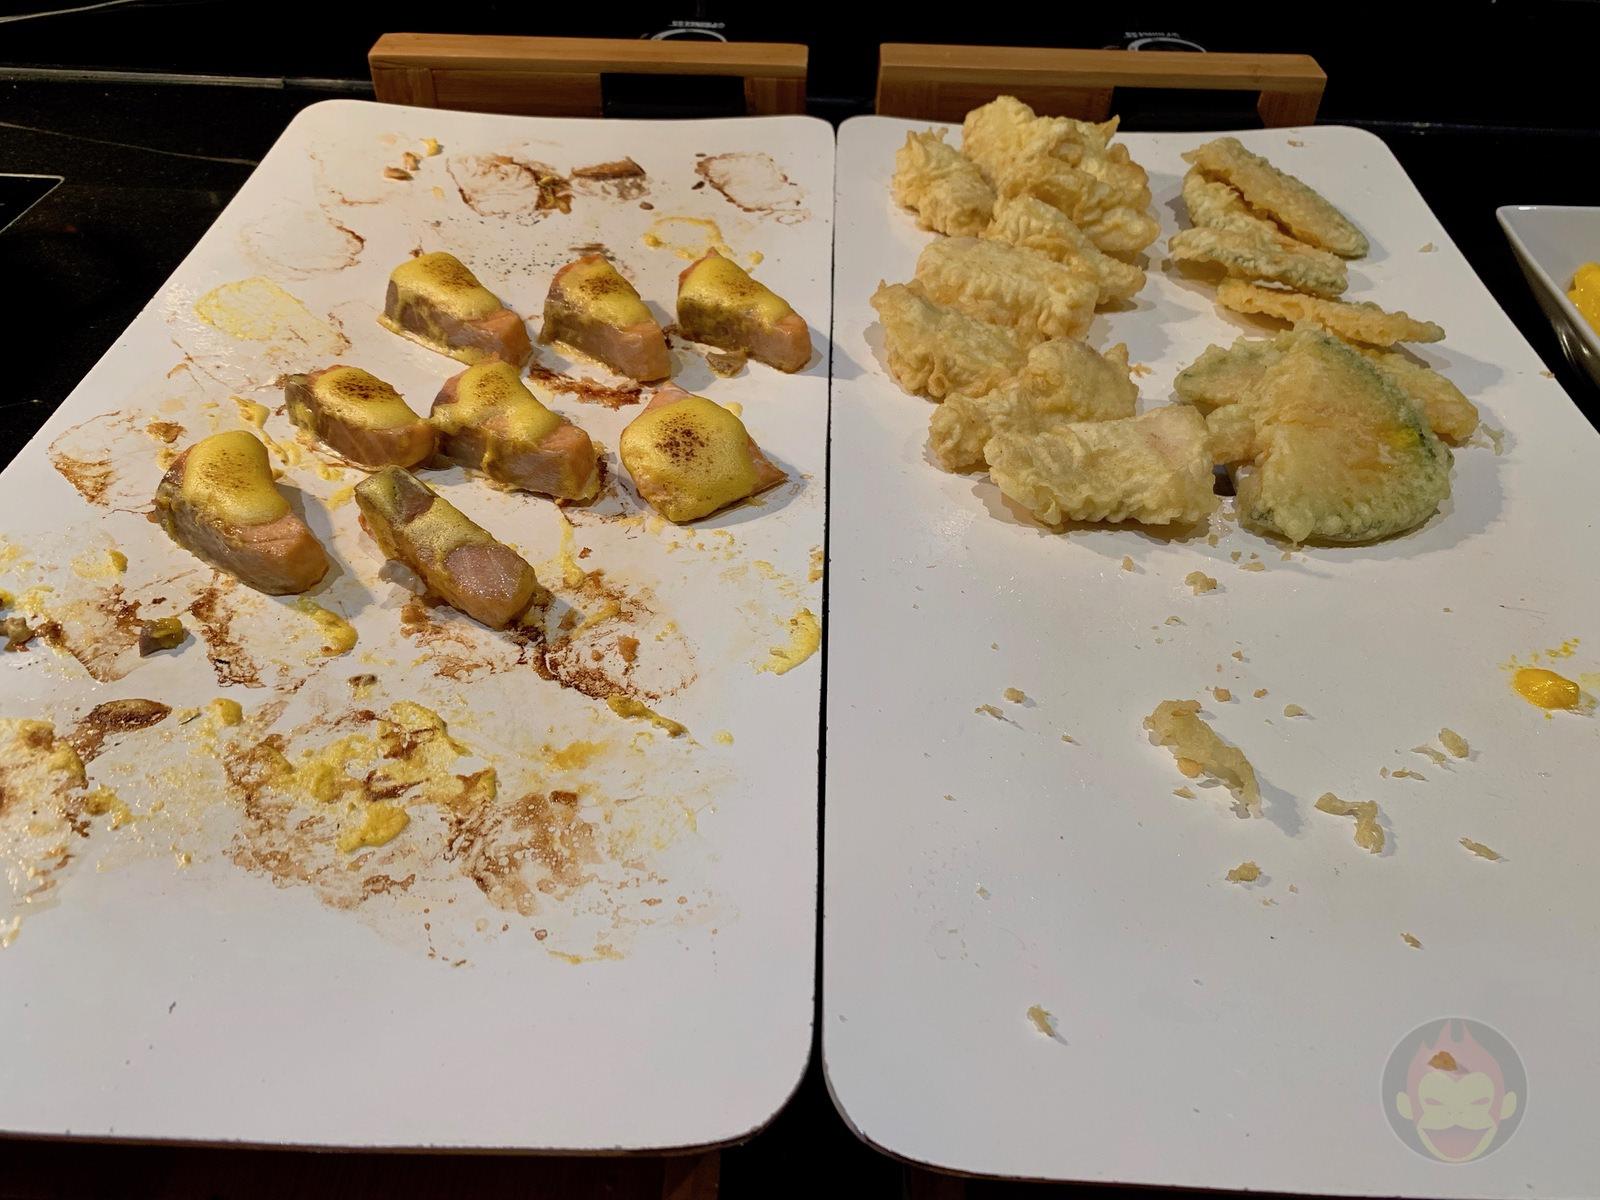 Westin tokyo theterrace lunch buffet 19